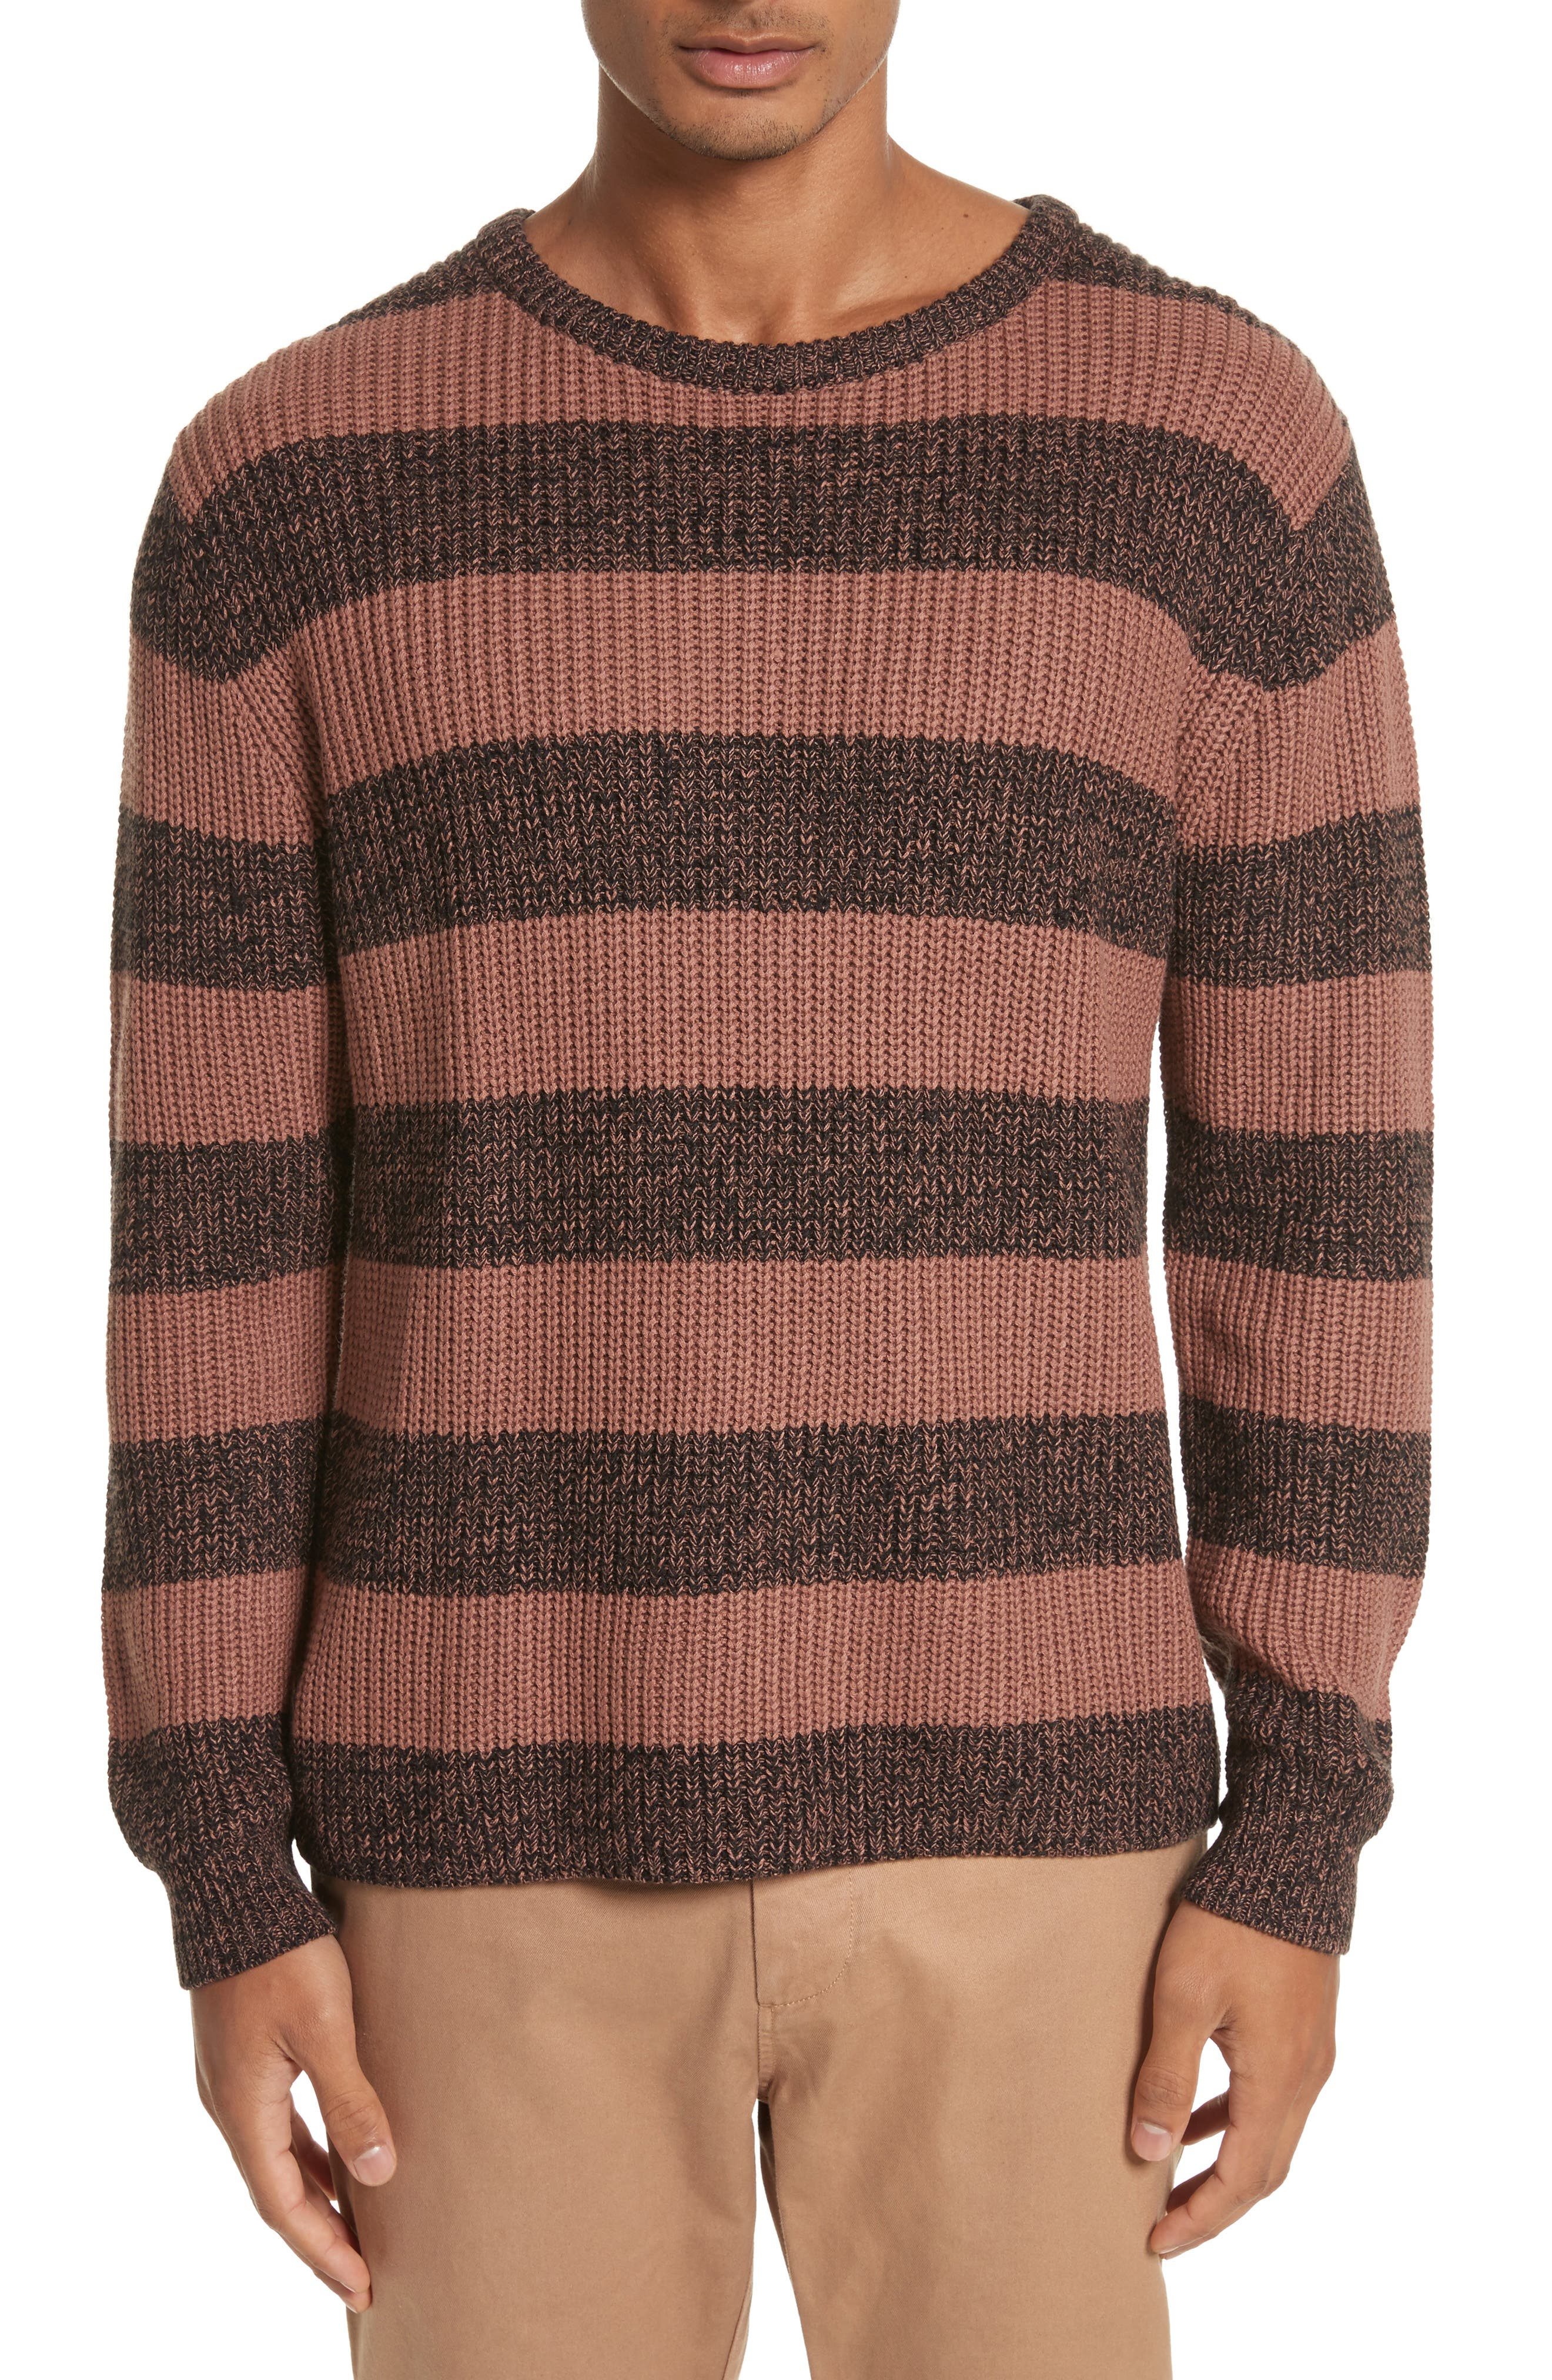 Lee Stripe Crewneck Sweater,                         Main,                         color, Bronze/Black